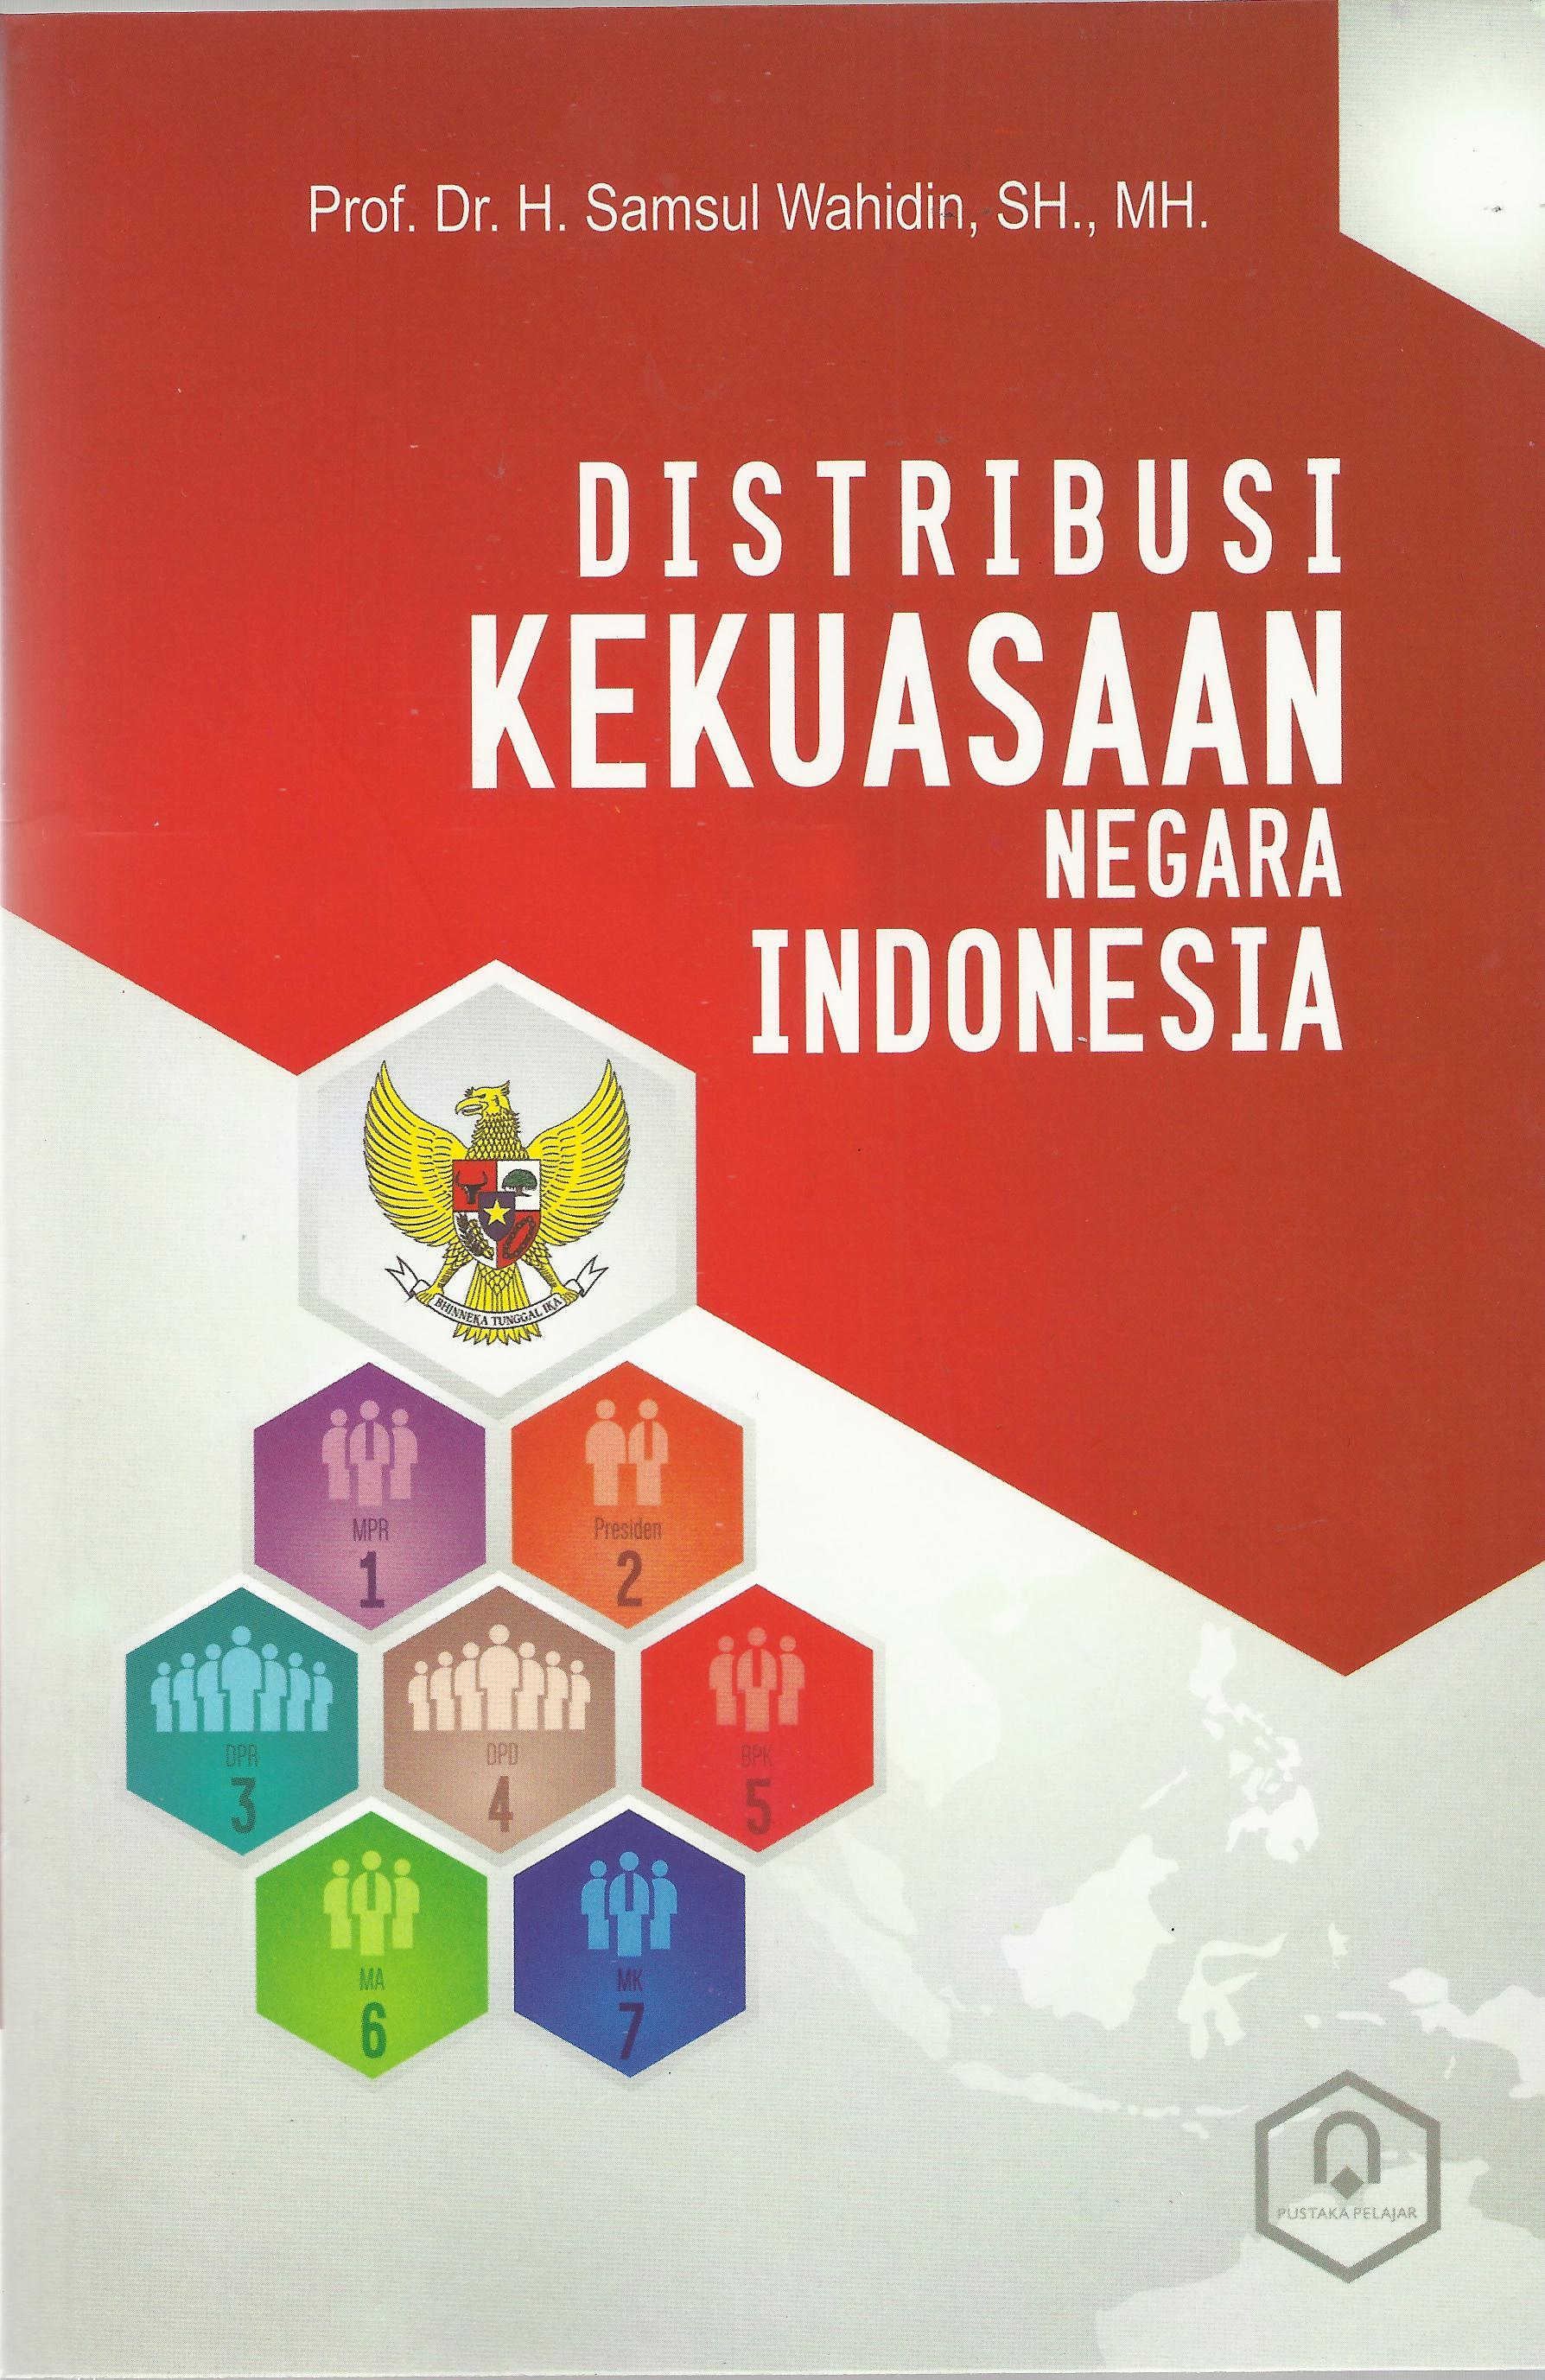 Distribusi Kekuasaan Negara Indonesia